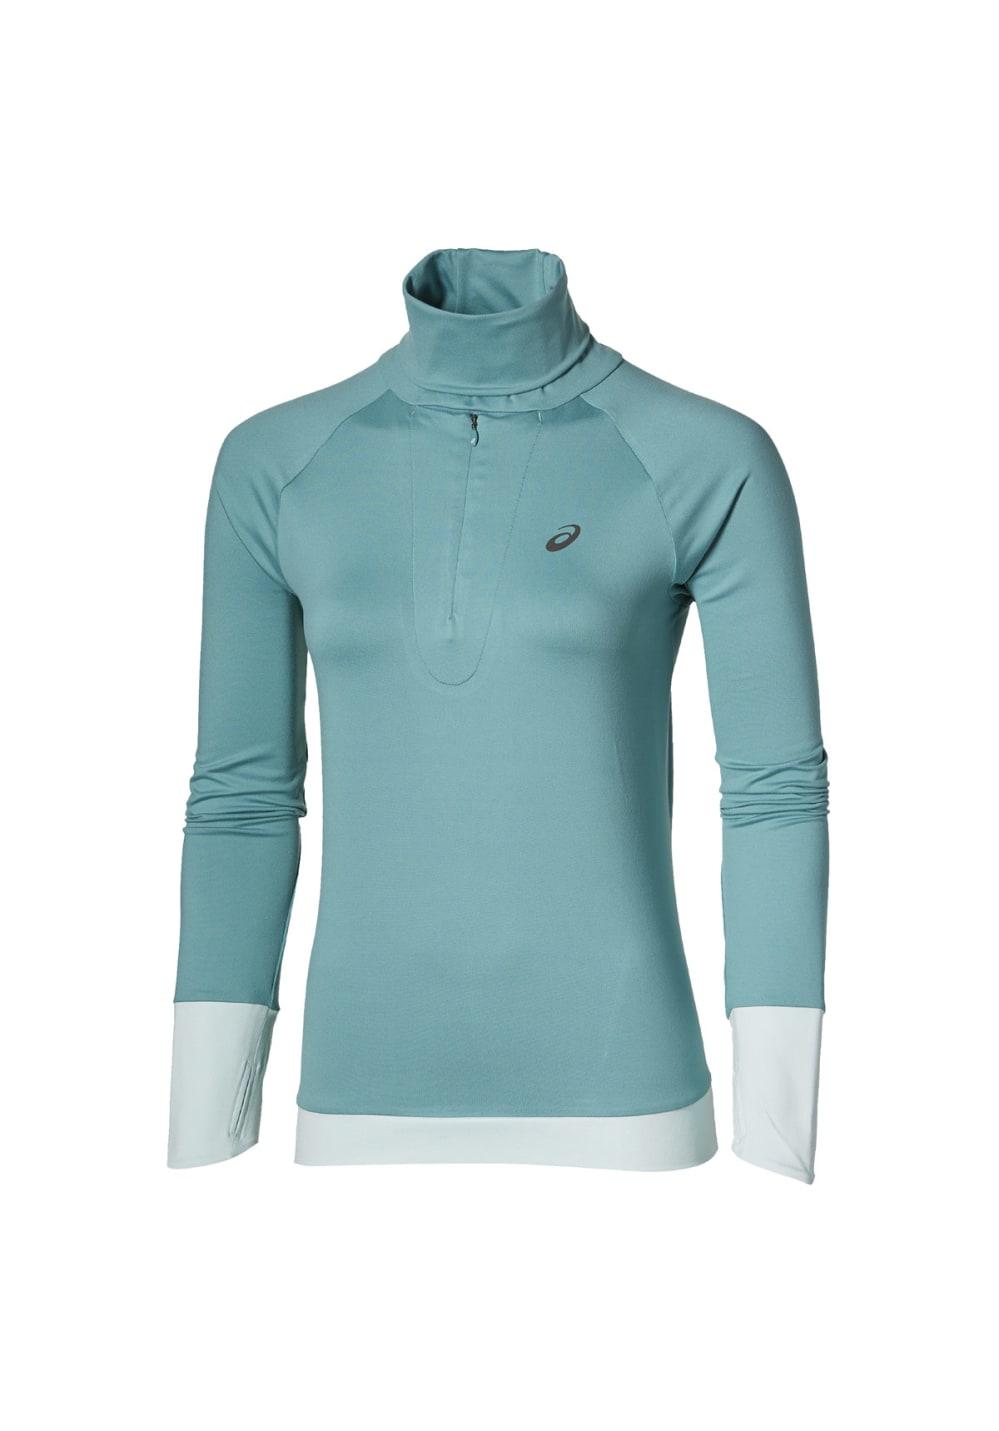 ASICS Thermopolis 1/2 Zip Long Sleeve - Laufshirts für Damen - Blau, Gr. XL